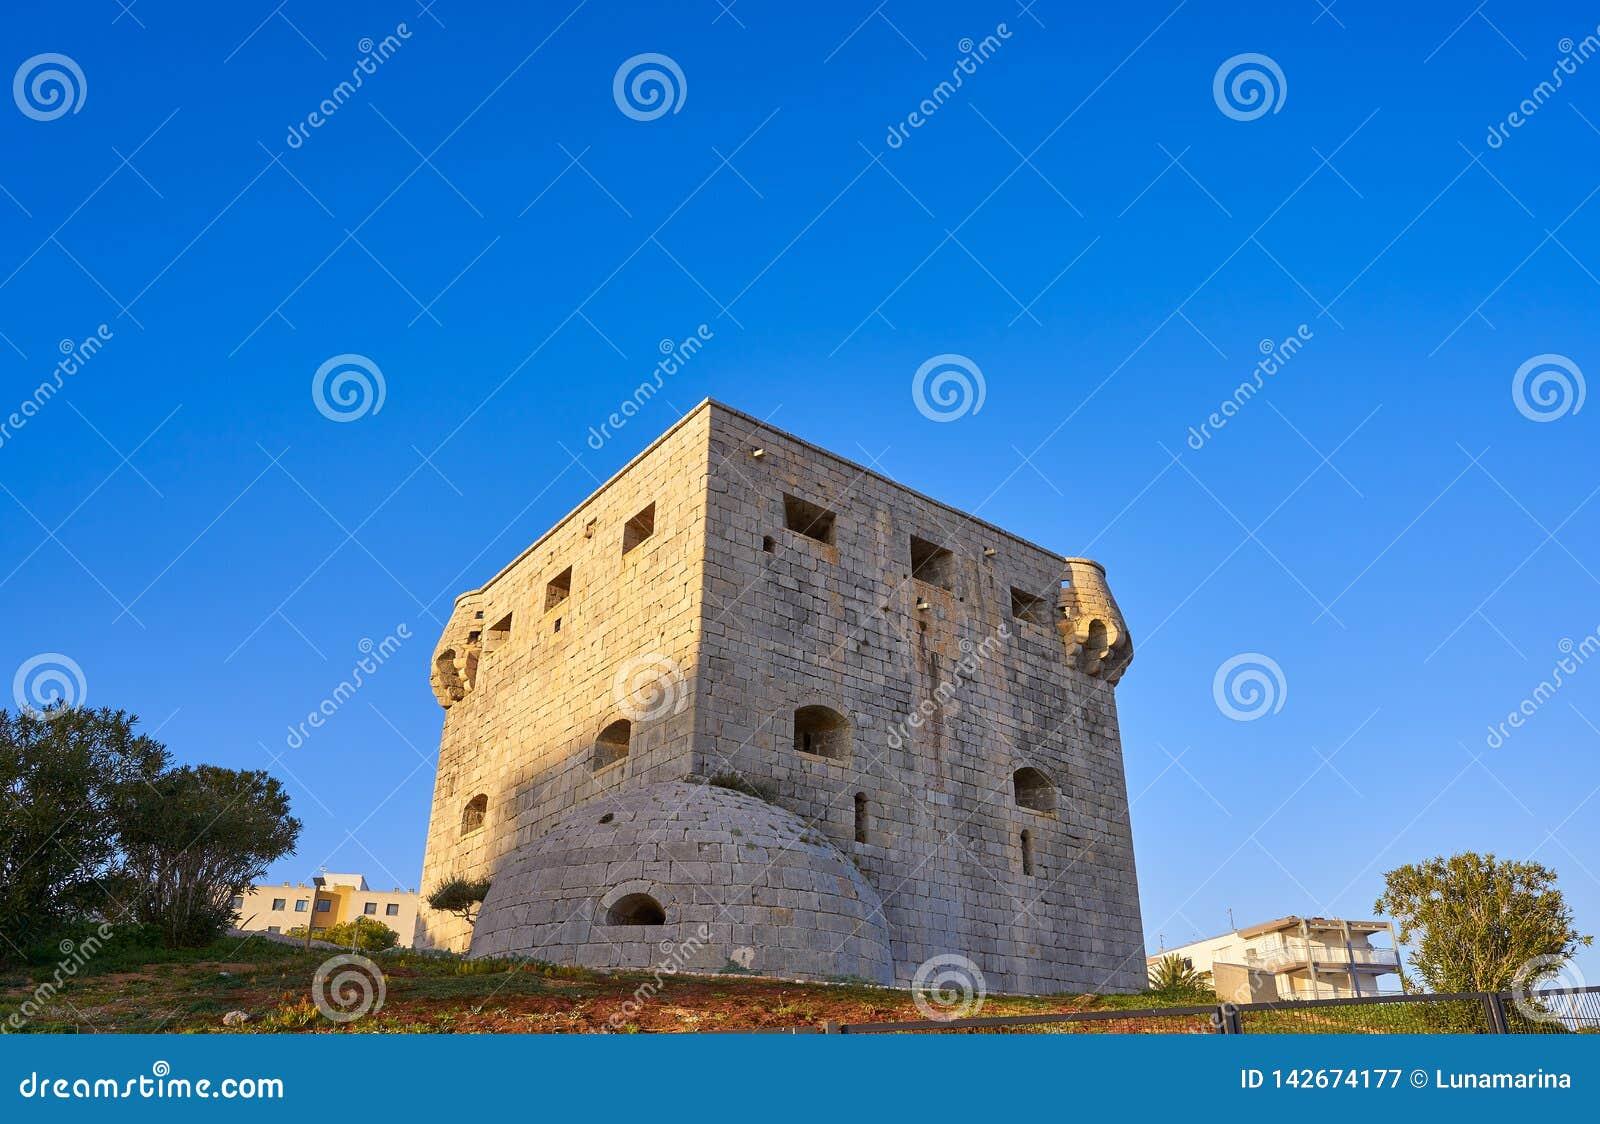 Torre del Rey Oropesa de Mar in Castellon